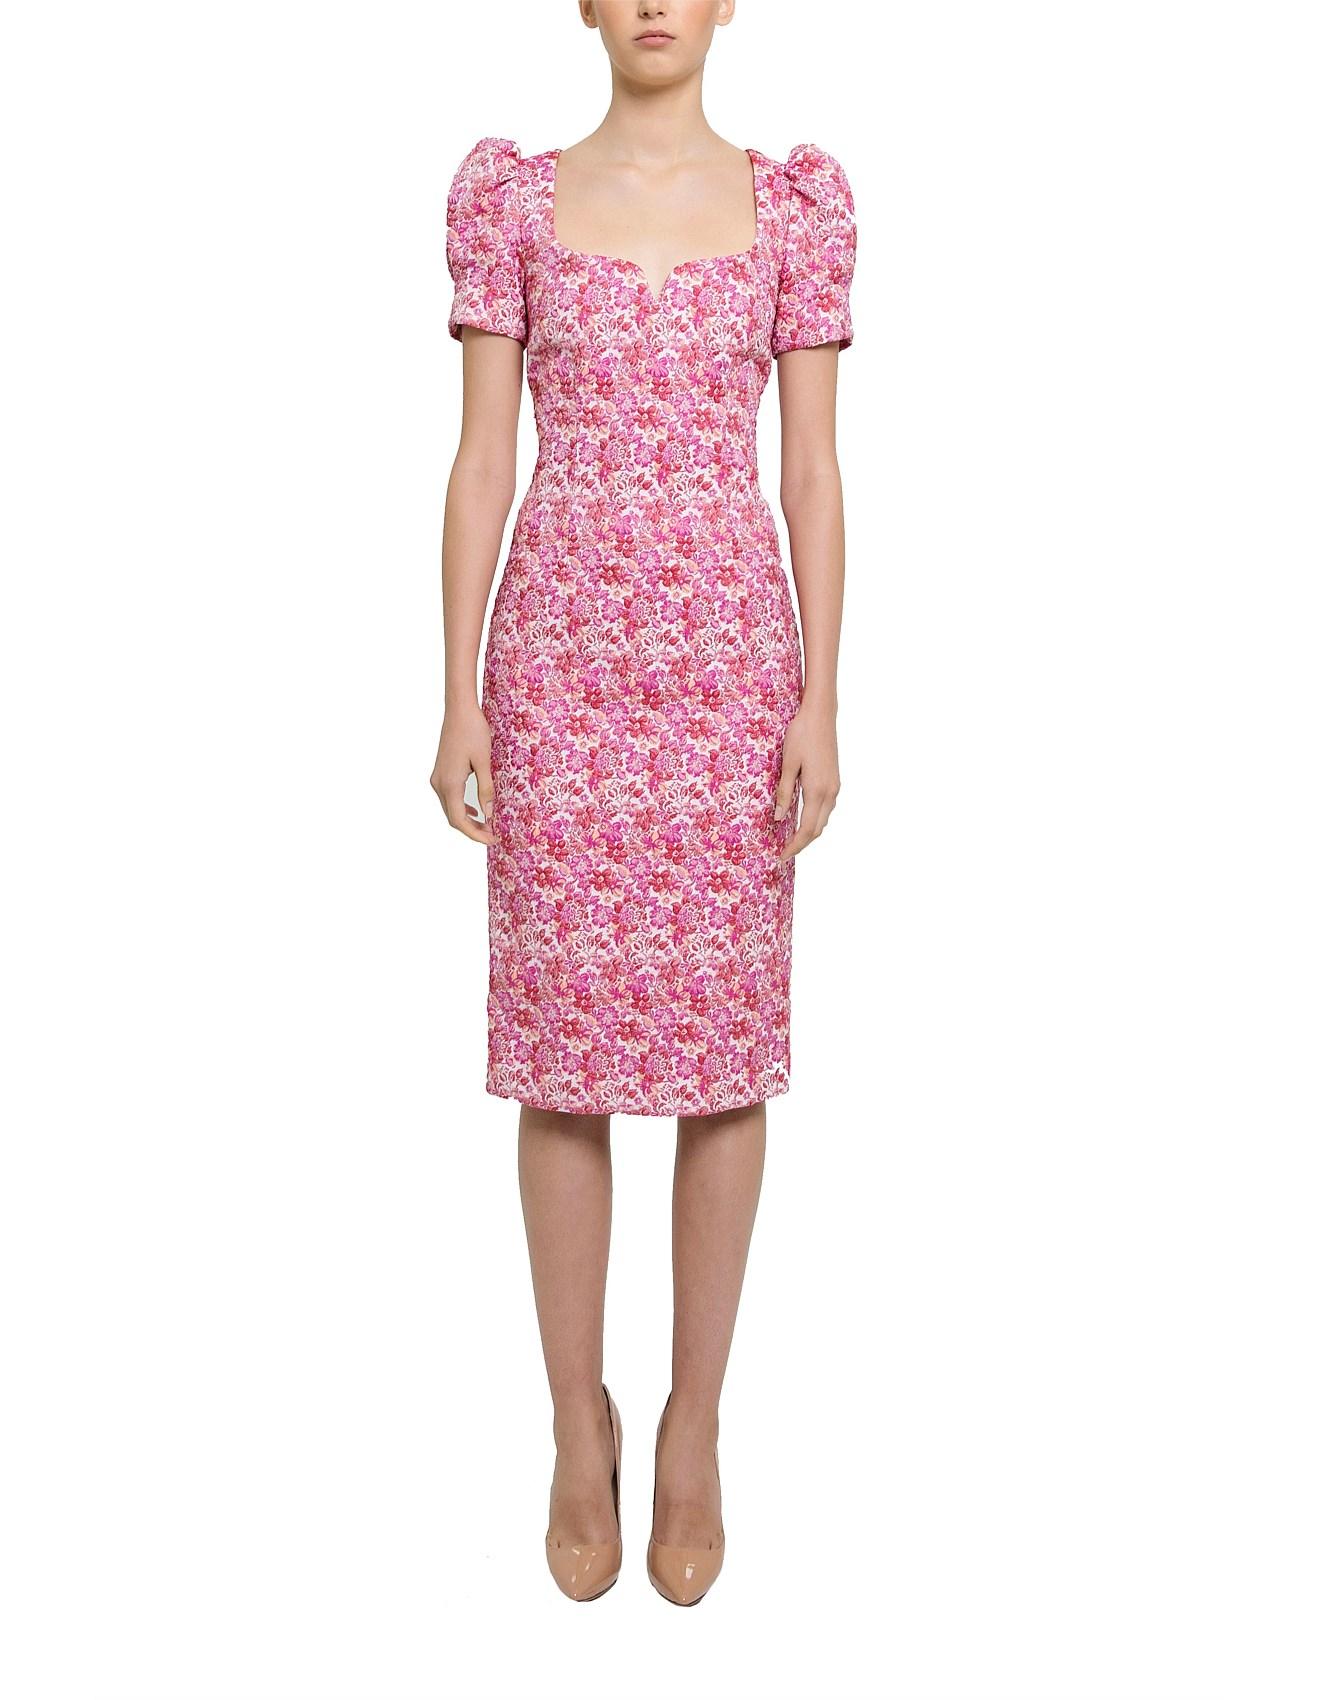 4d69327387c Women s Dresses